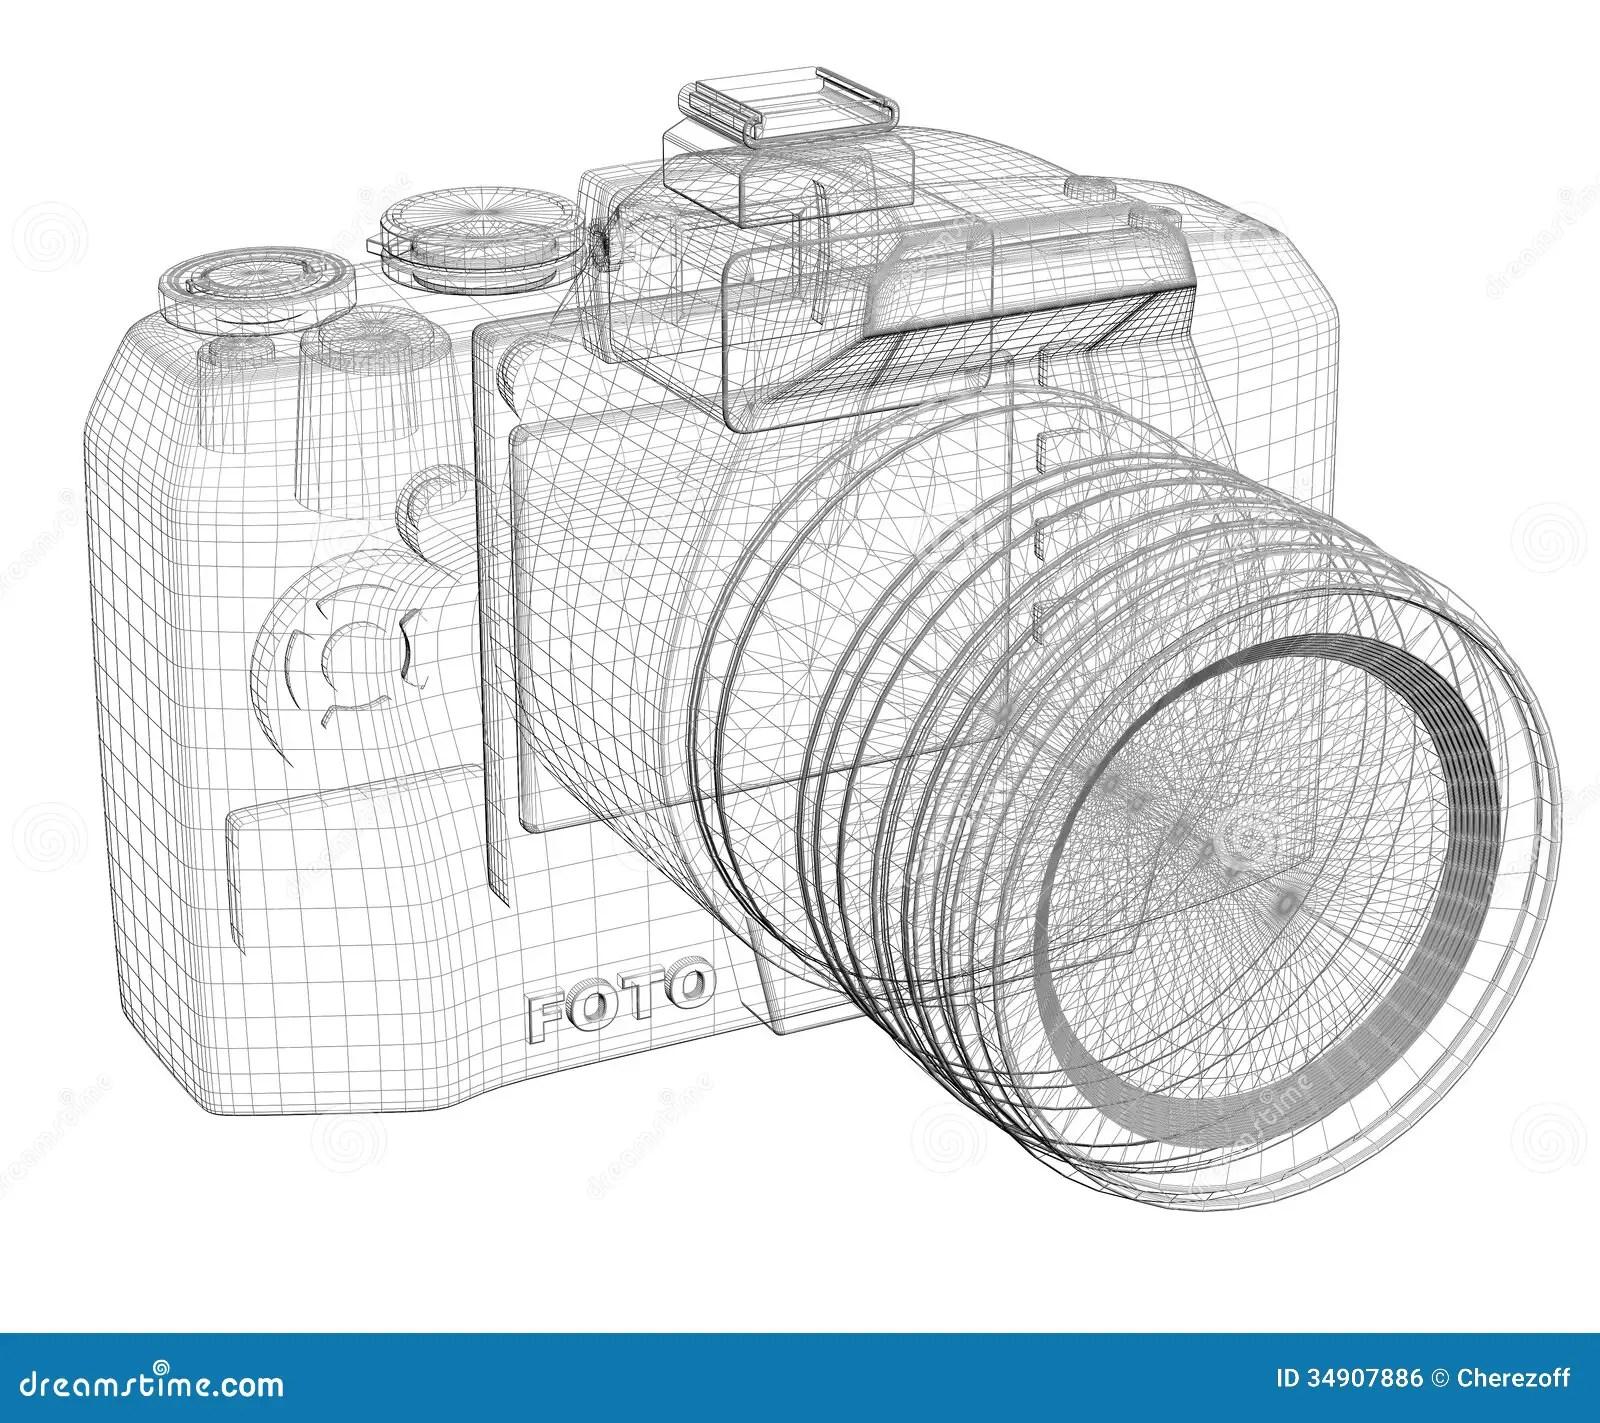 SLR camera. Wire frame stock illustration. Image of